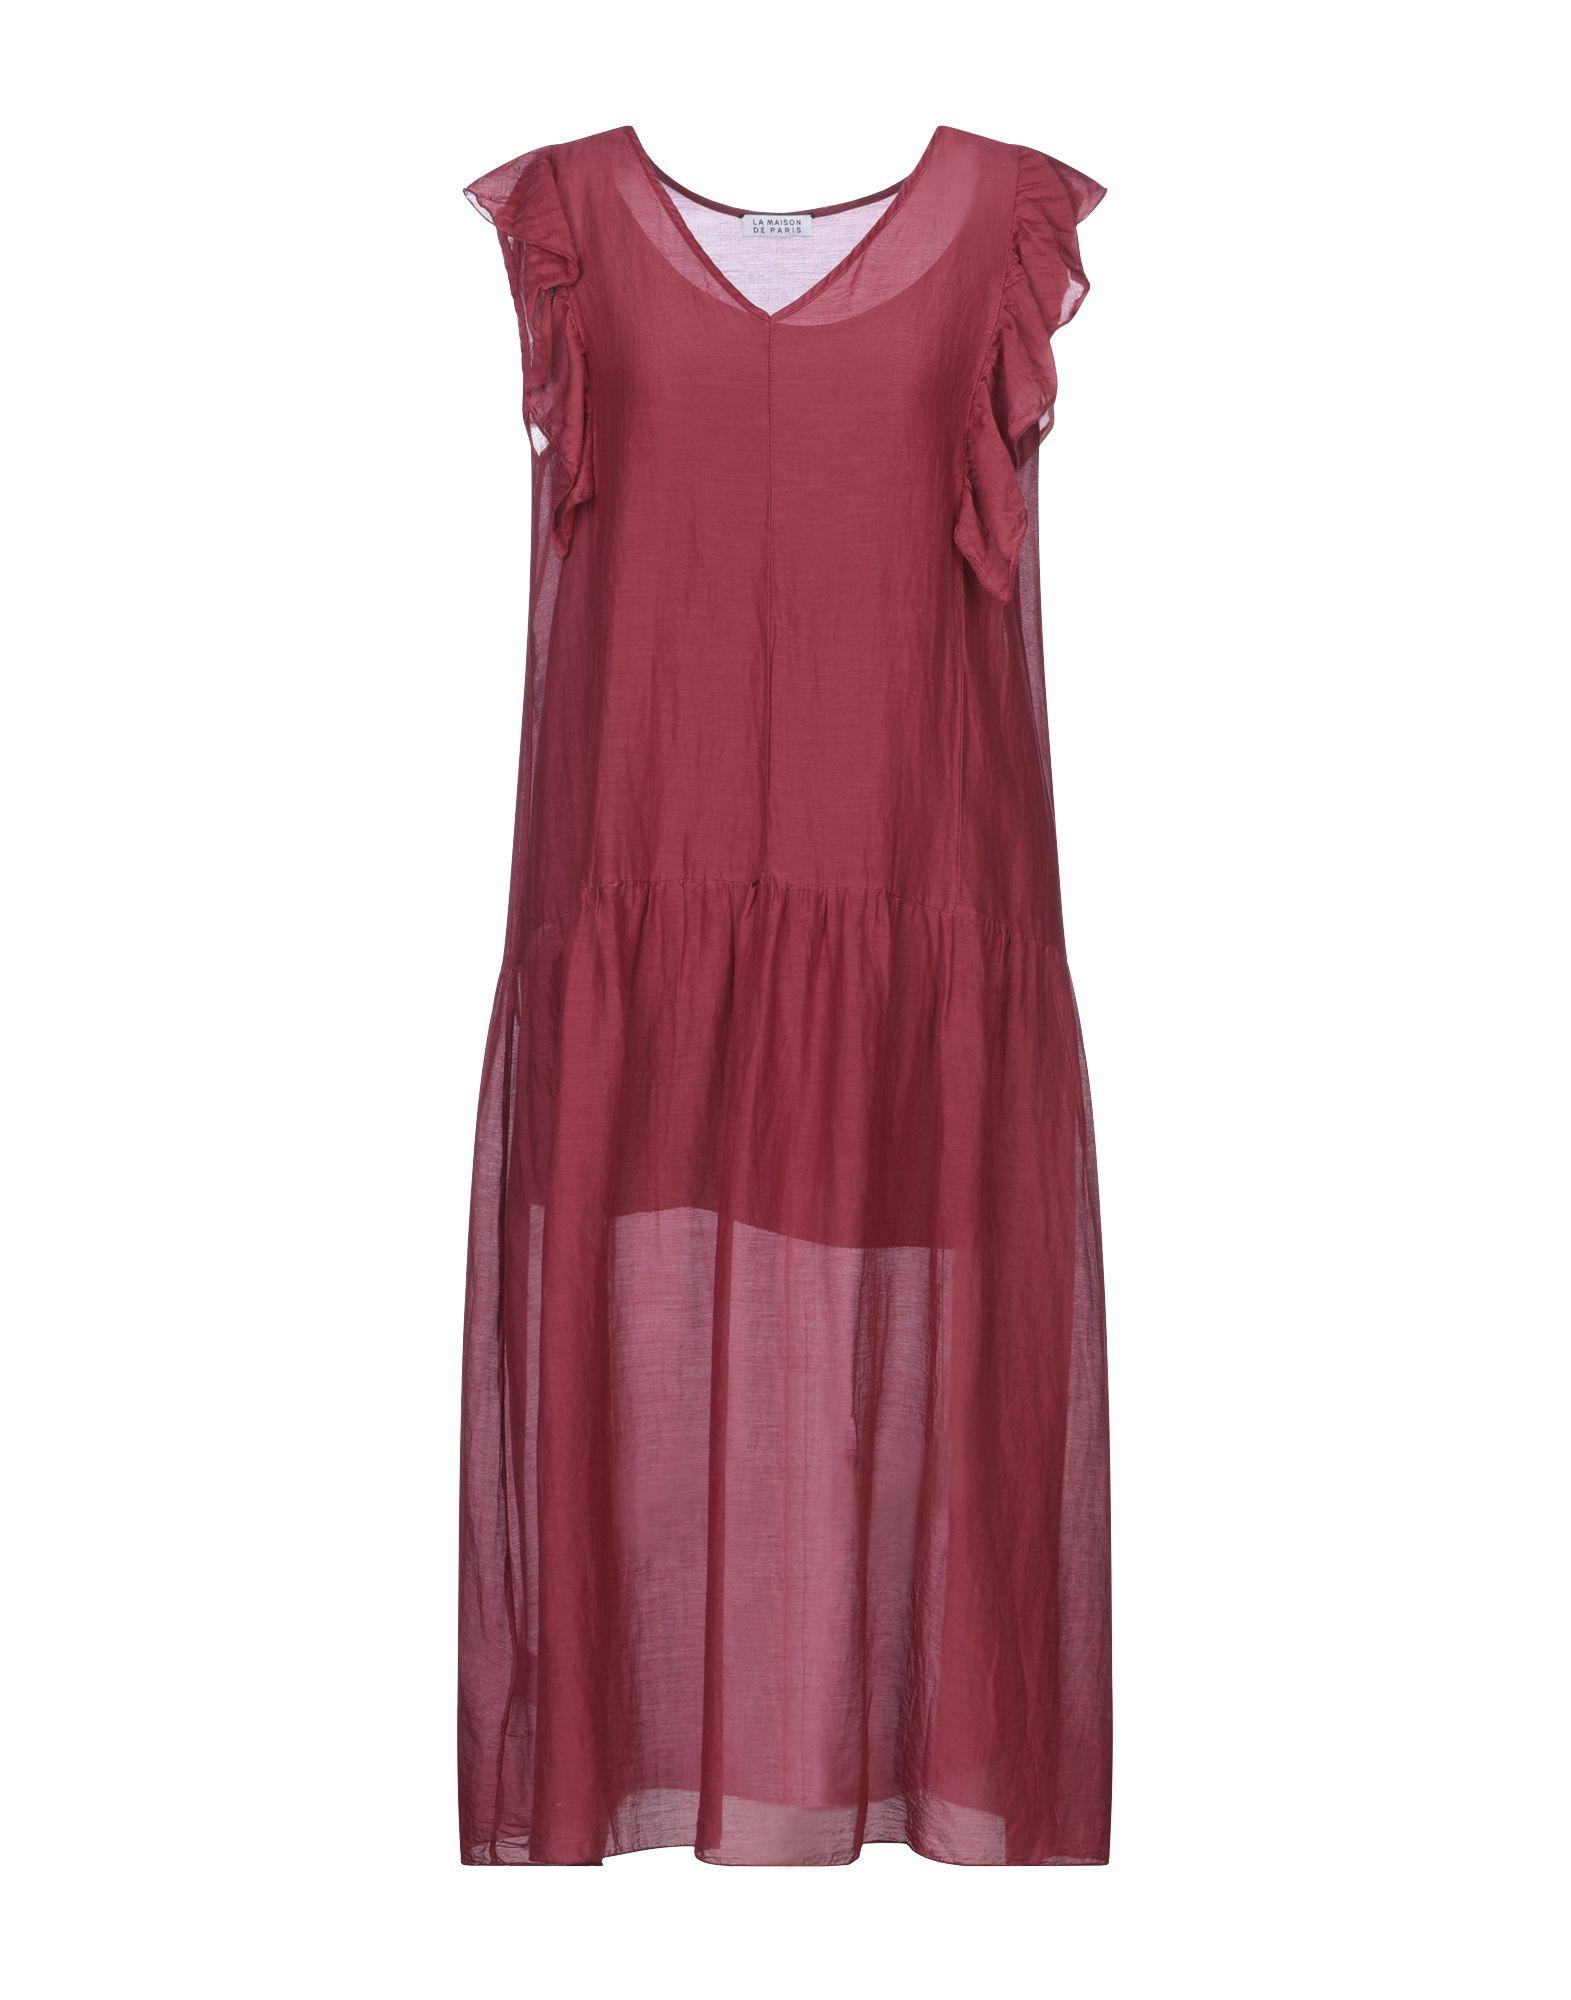 LA MAISON DE PARIS Платье длиной 3/4